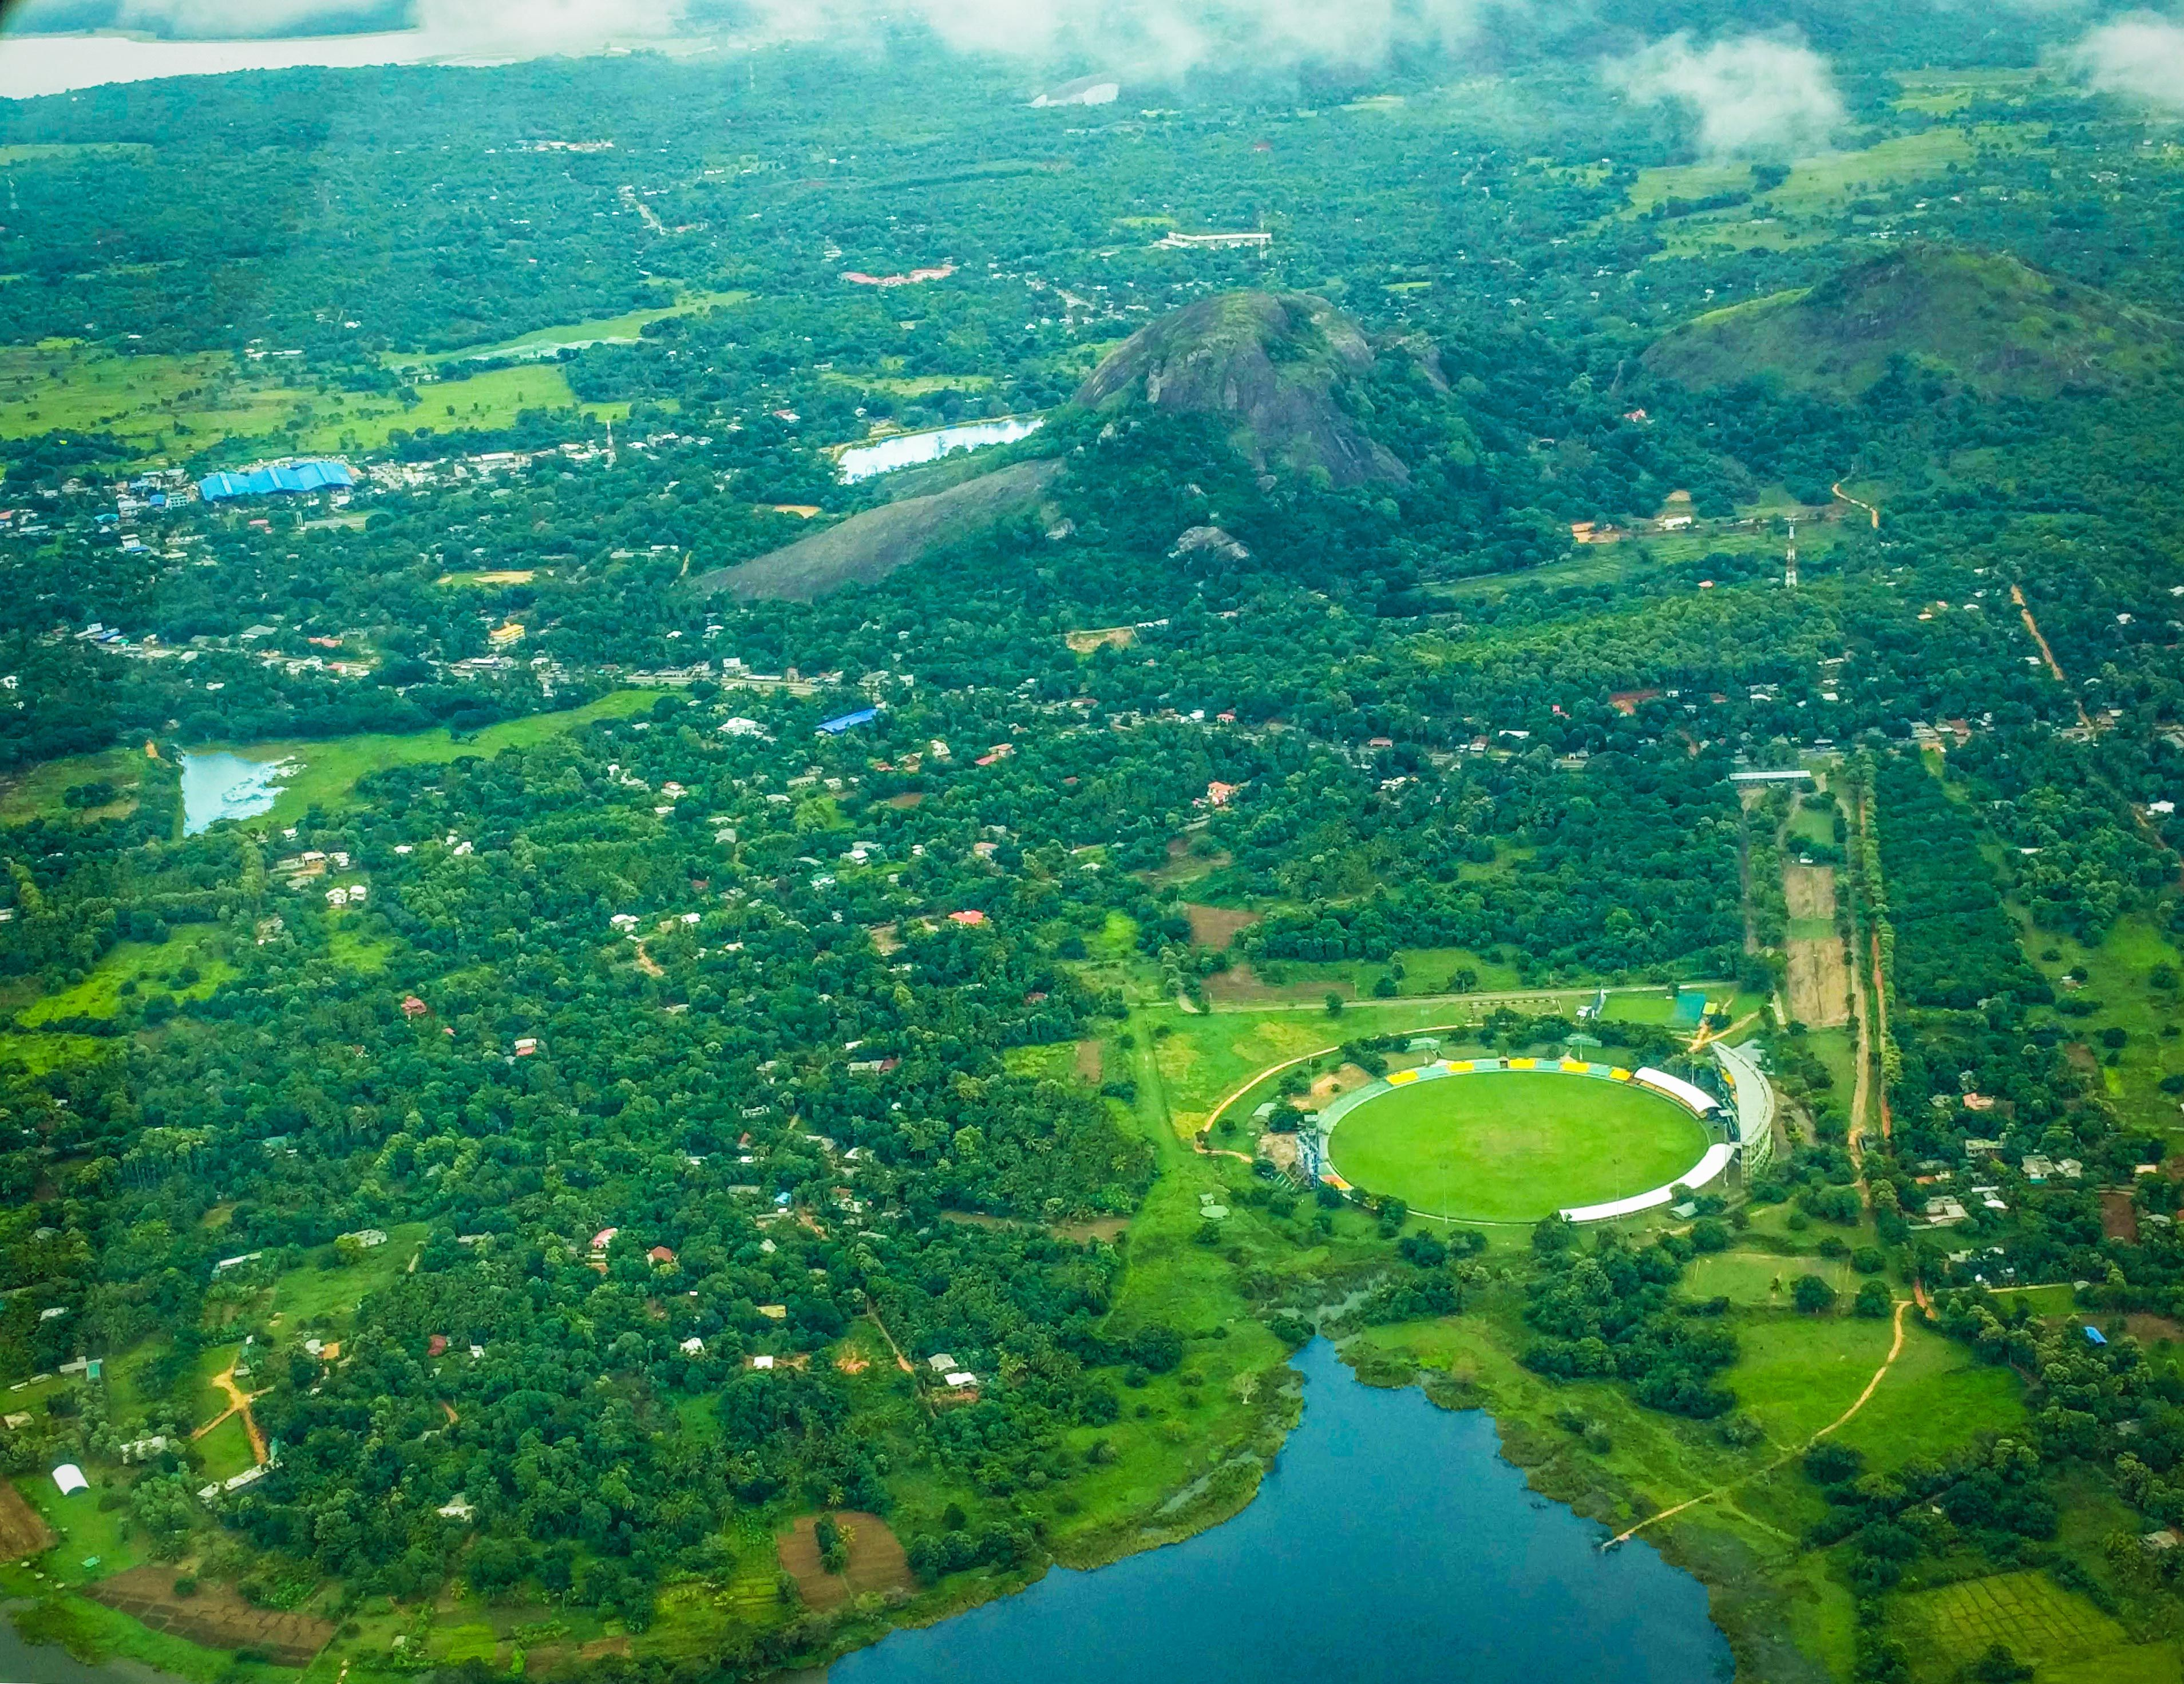 Overflying The Breathtaking Rangiri Dambulla International Cricket